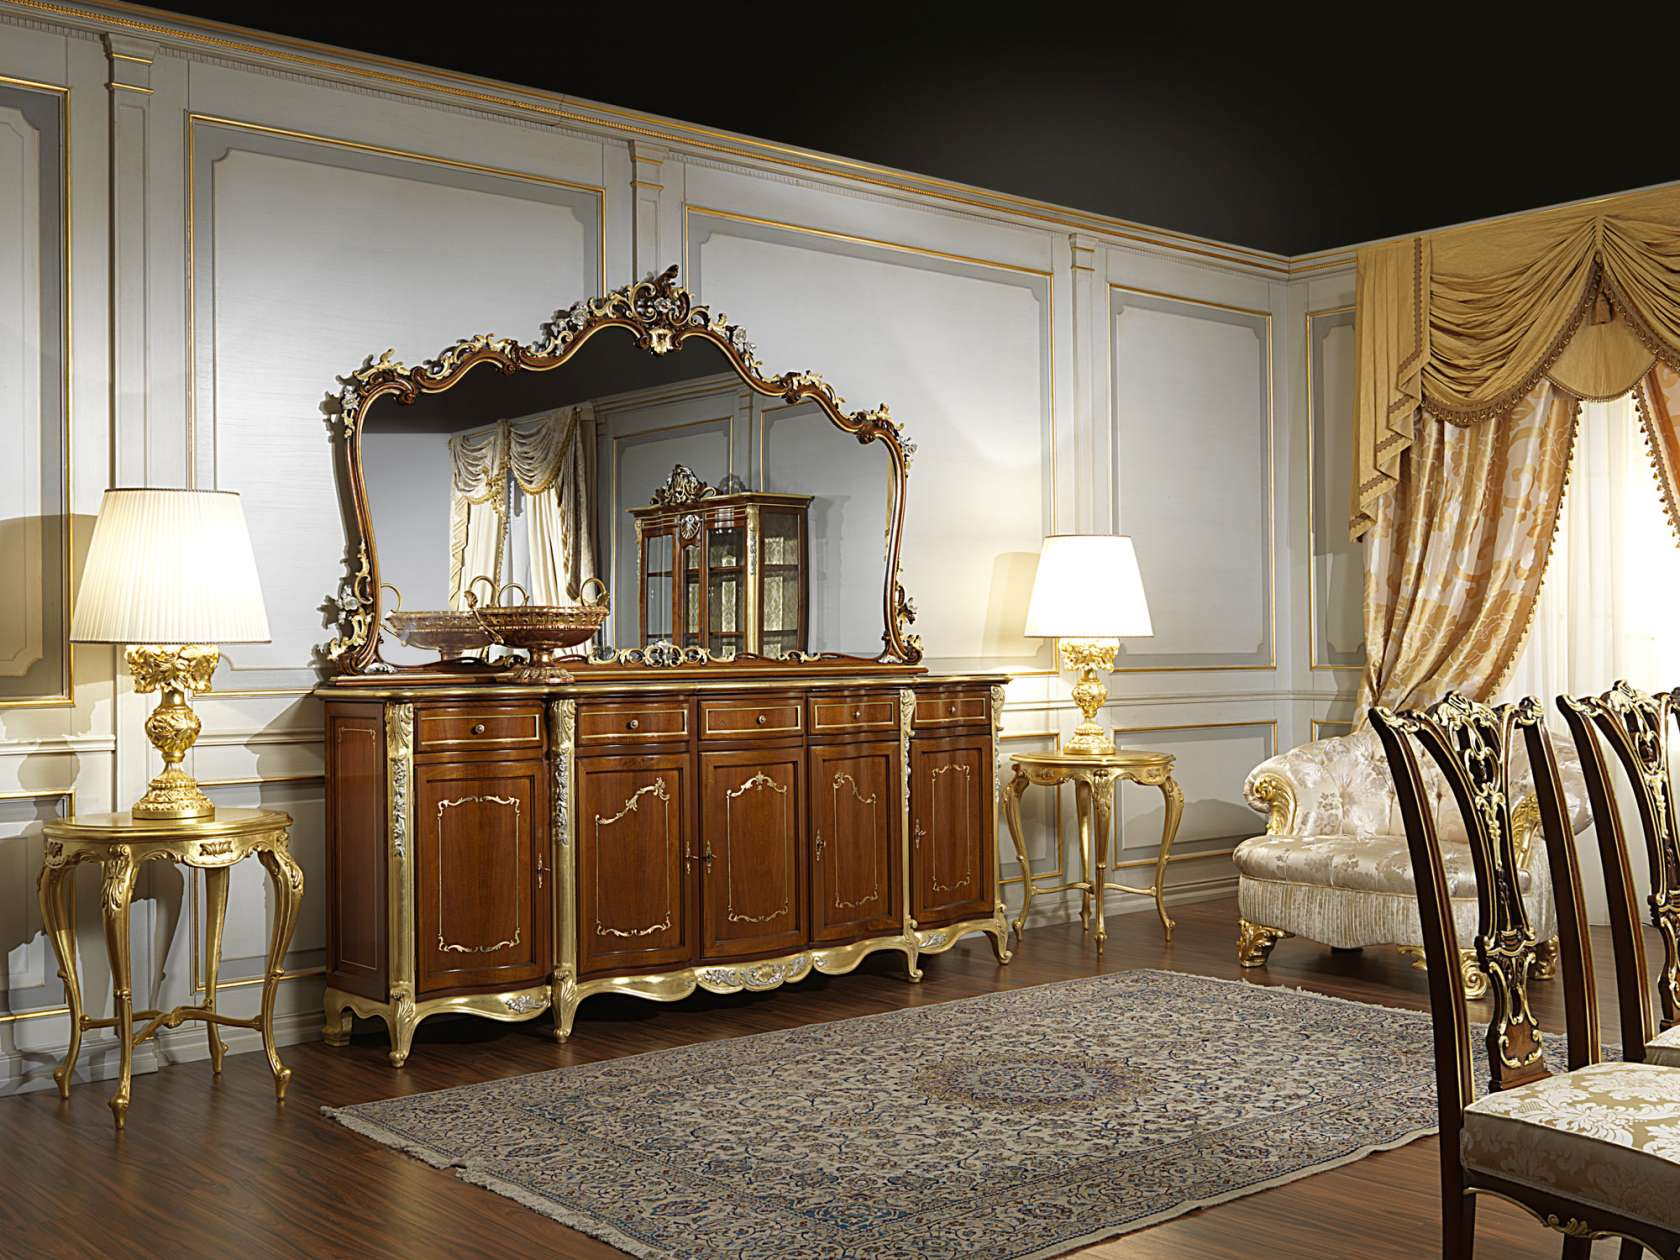 Credenza classica sala da pranzo in stile Luigi XV | Vimercati ...